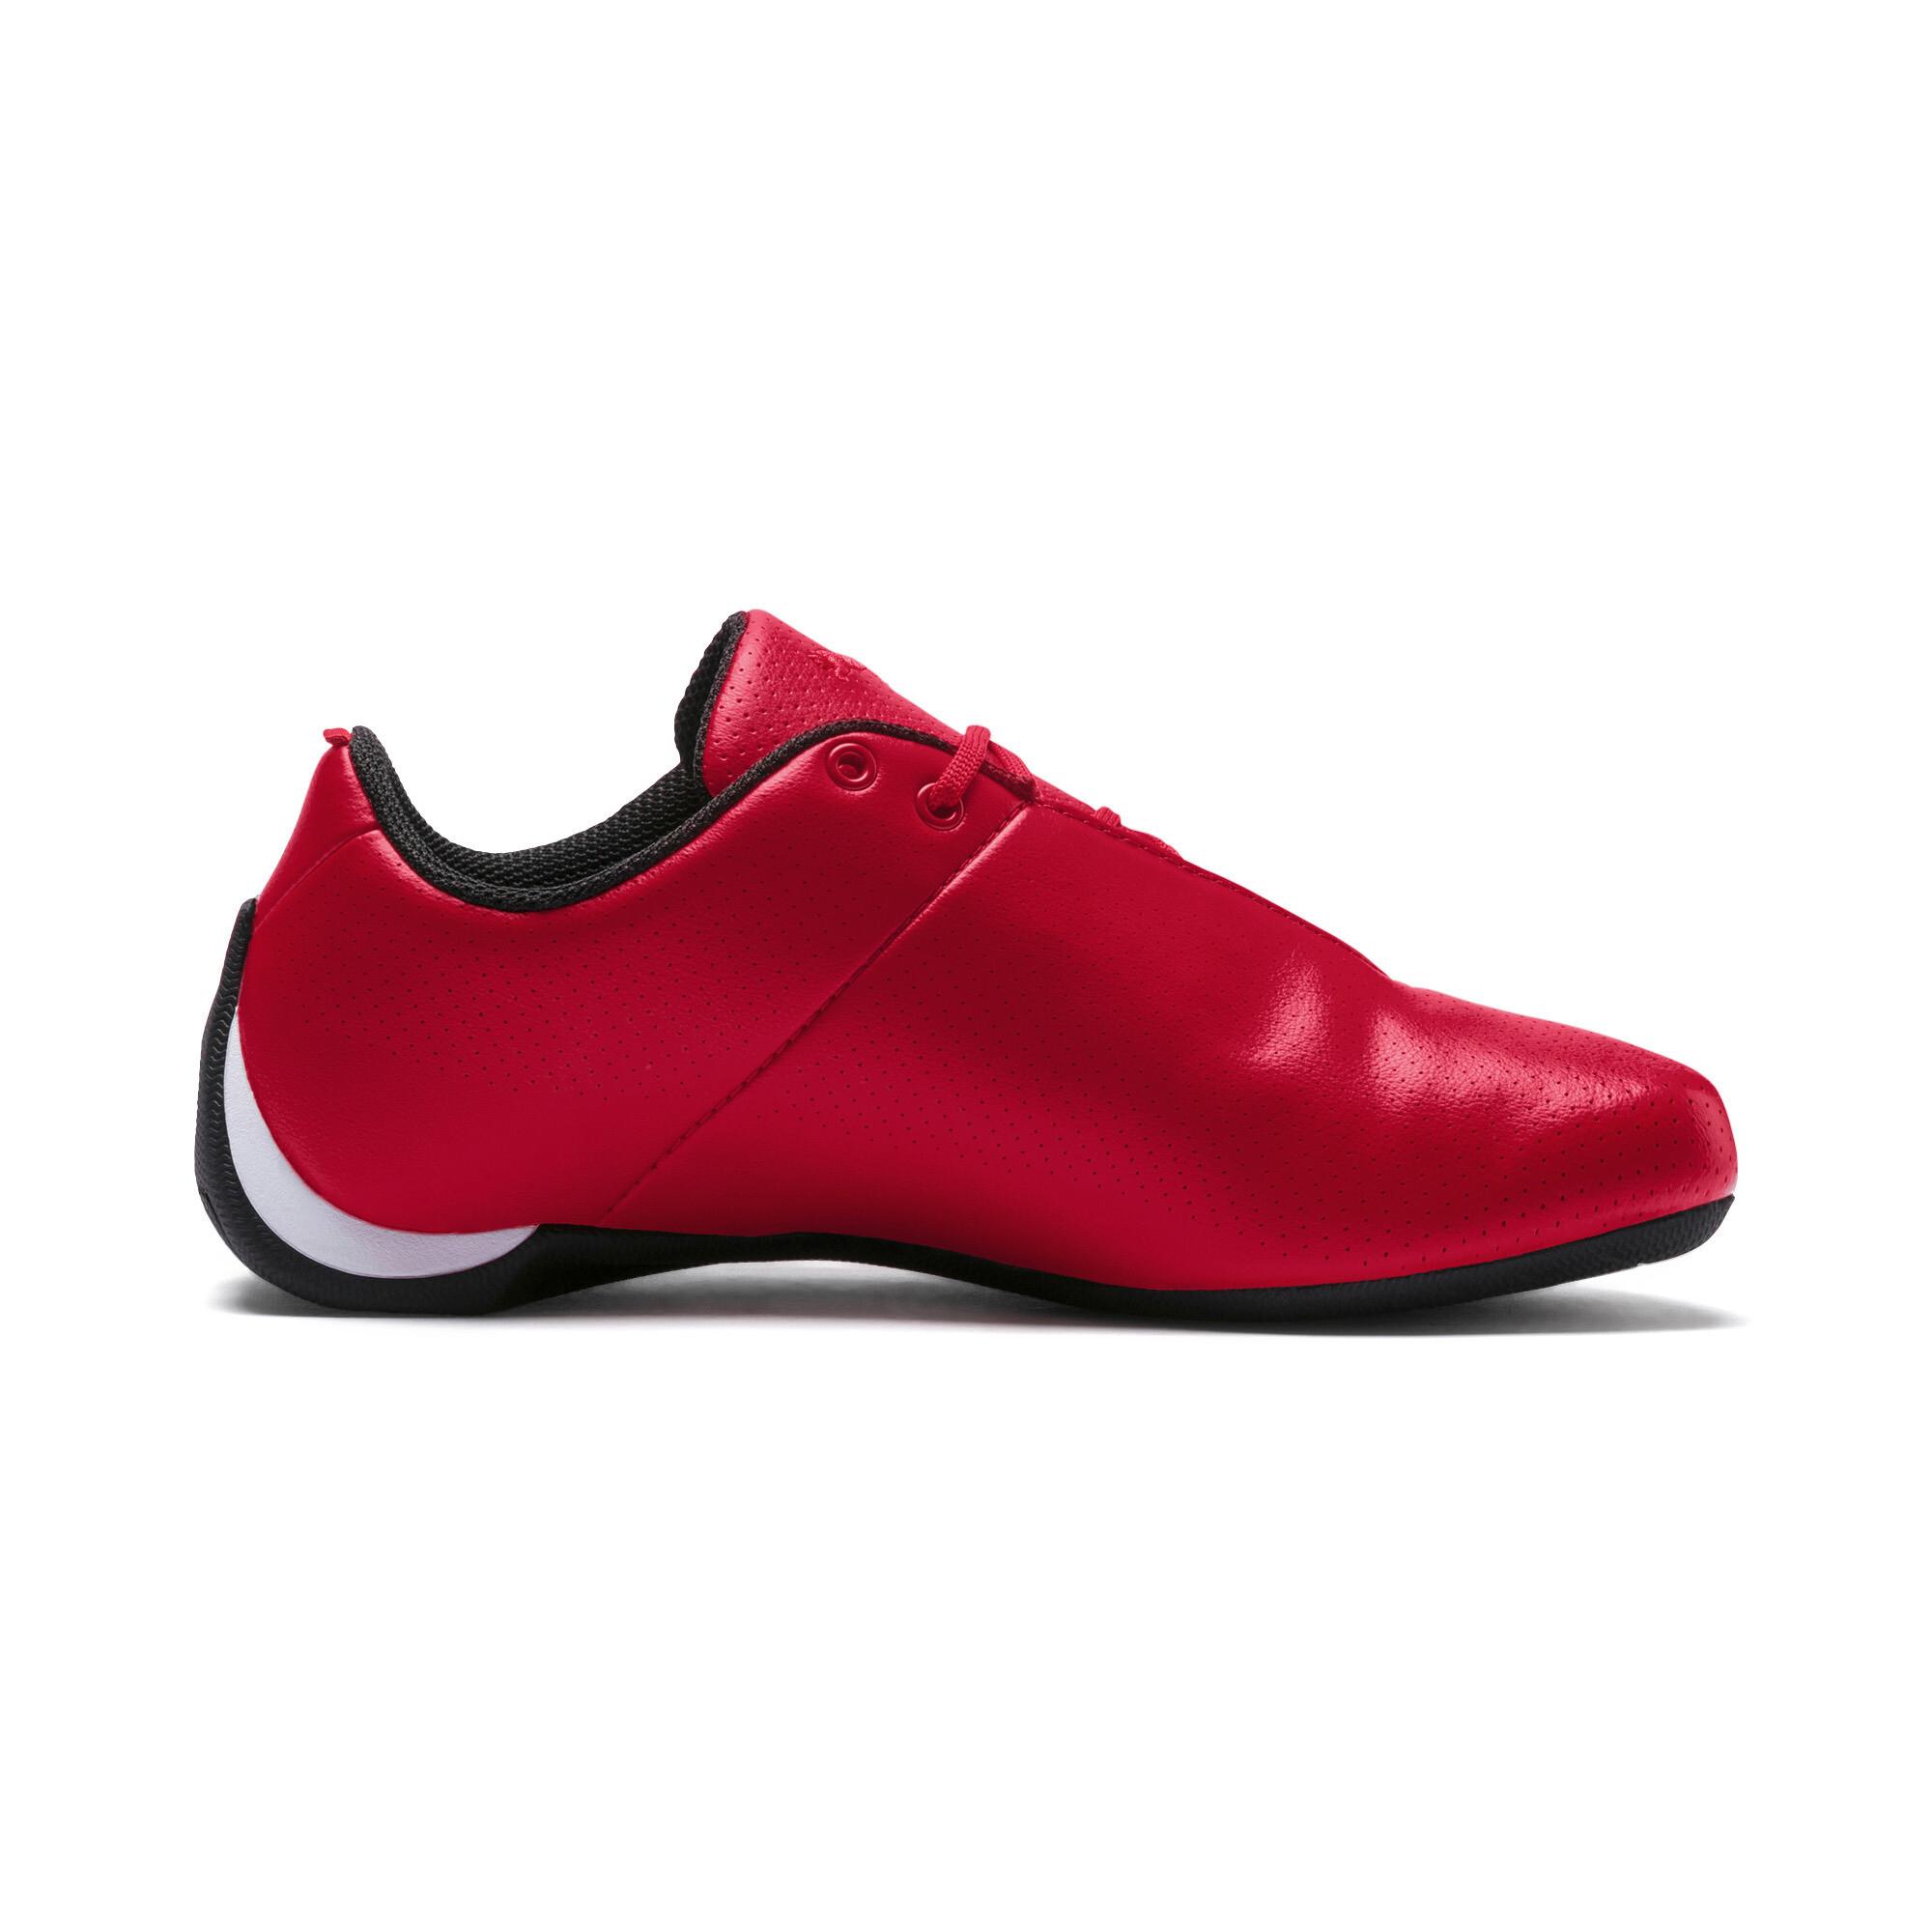 PUMA-Scuderia-Ferrari-Future-Cat-Ultra-Shoes-JR-Kids-Shoe-Auto thumbnail 6